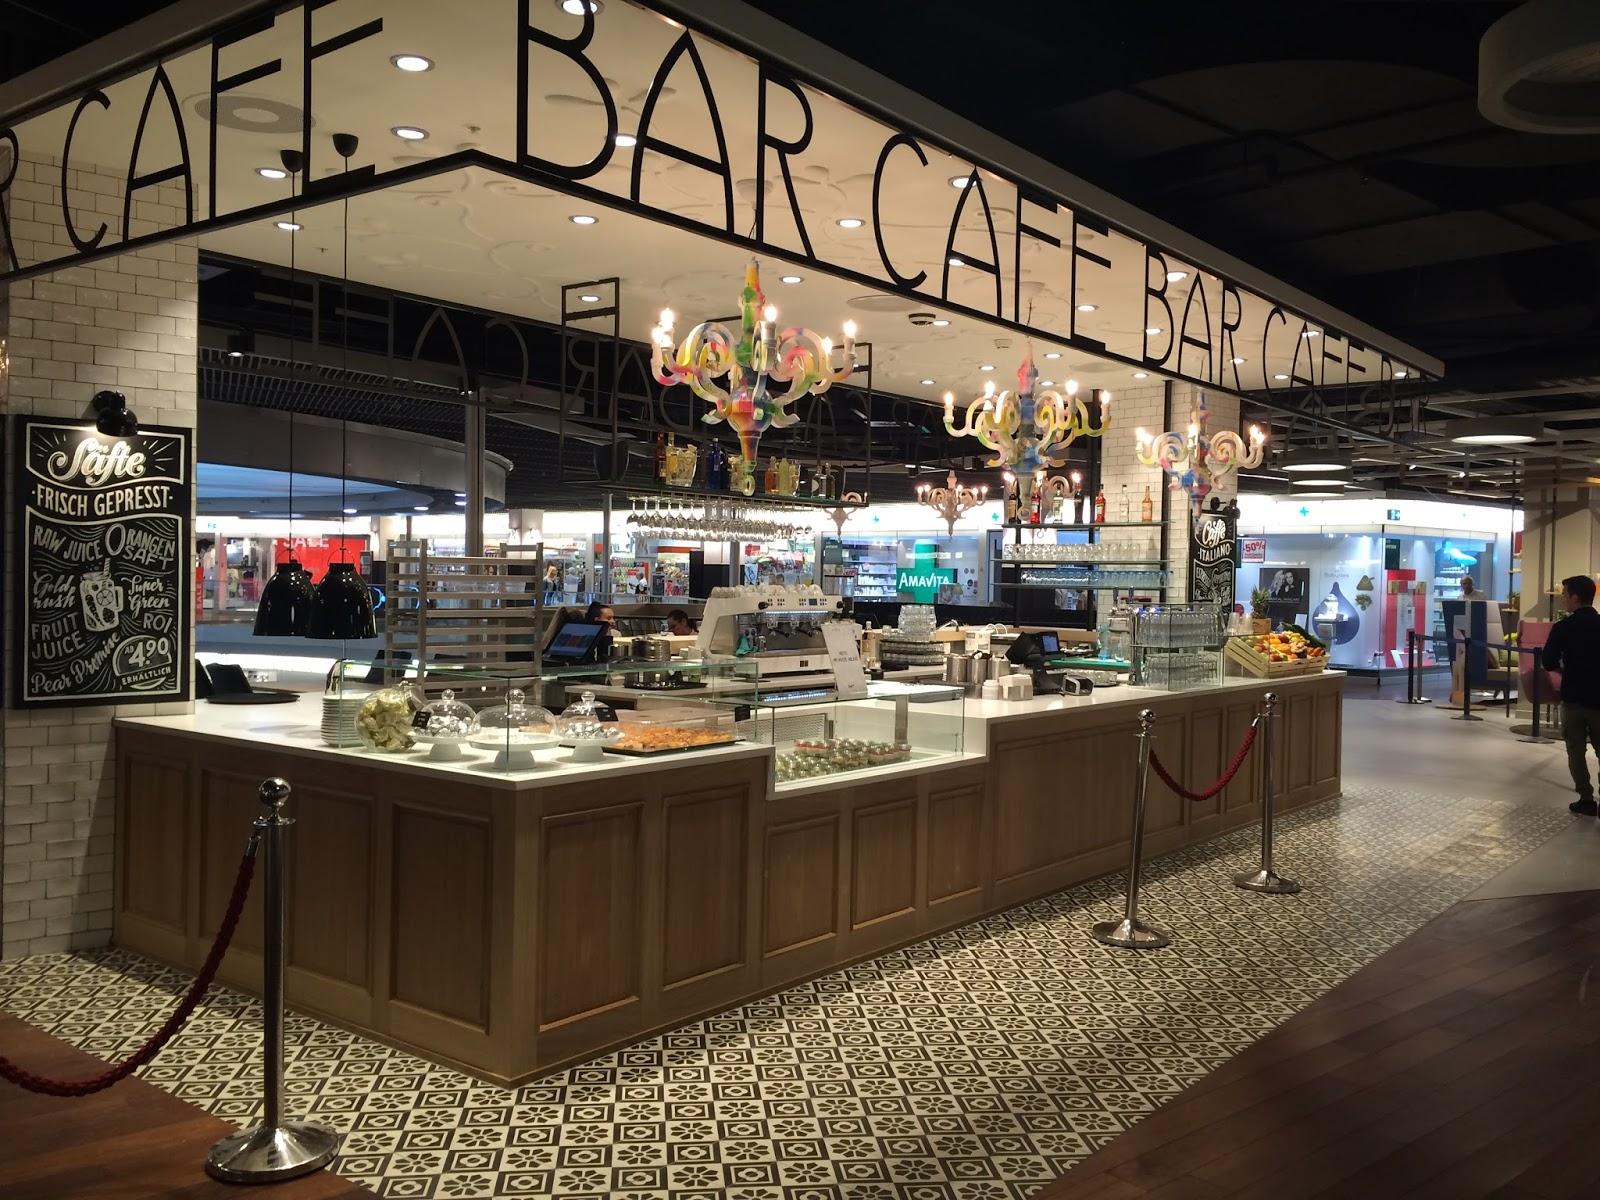 Cafe – Bar – Restaurant Foodcourt Tivoli Spreitenbach